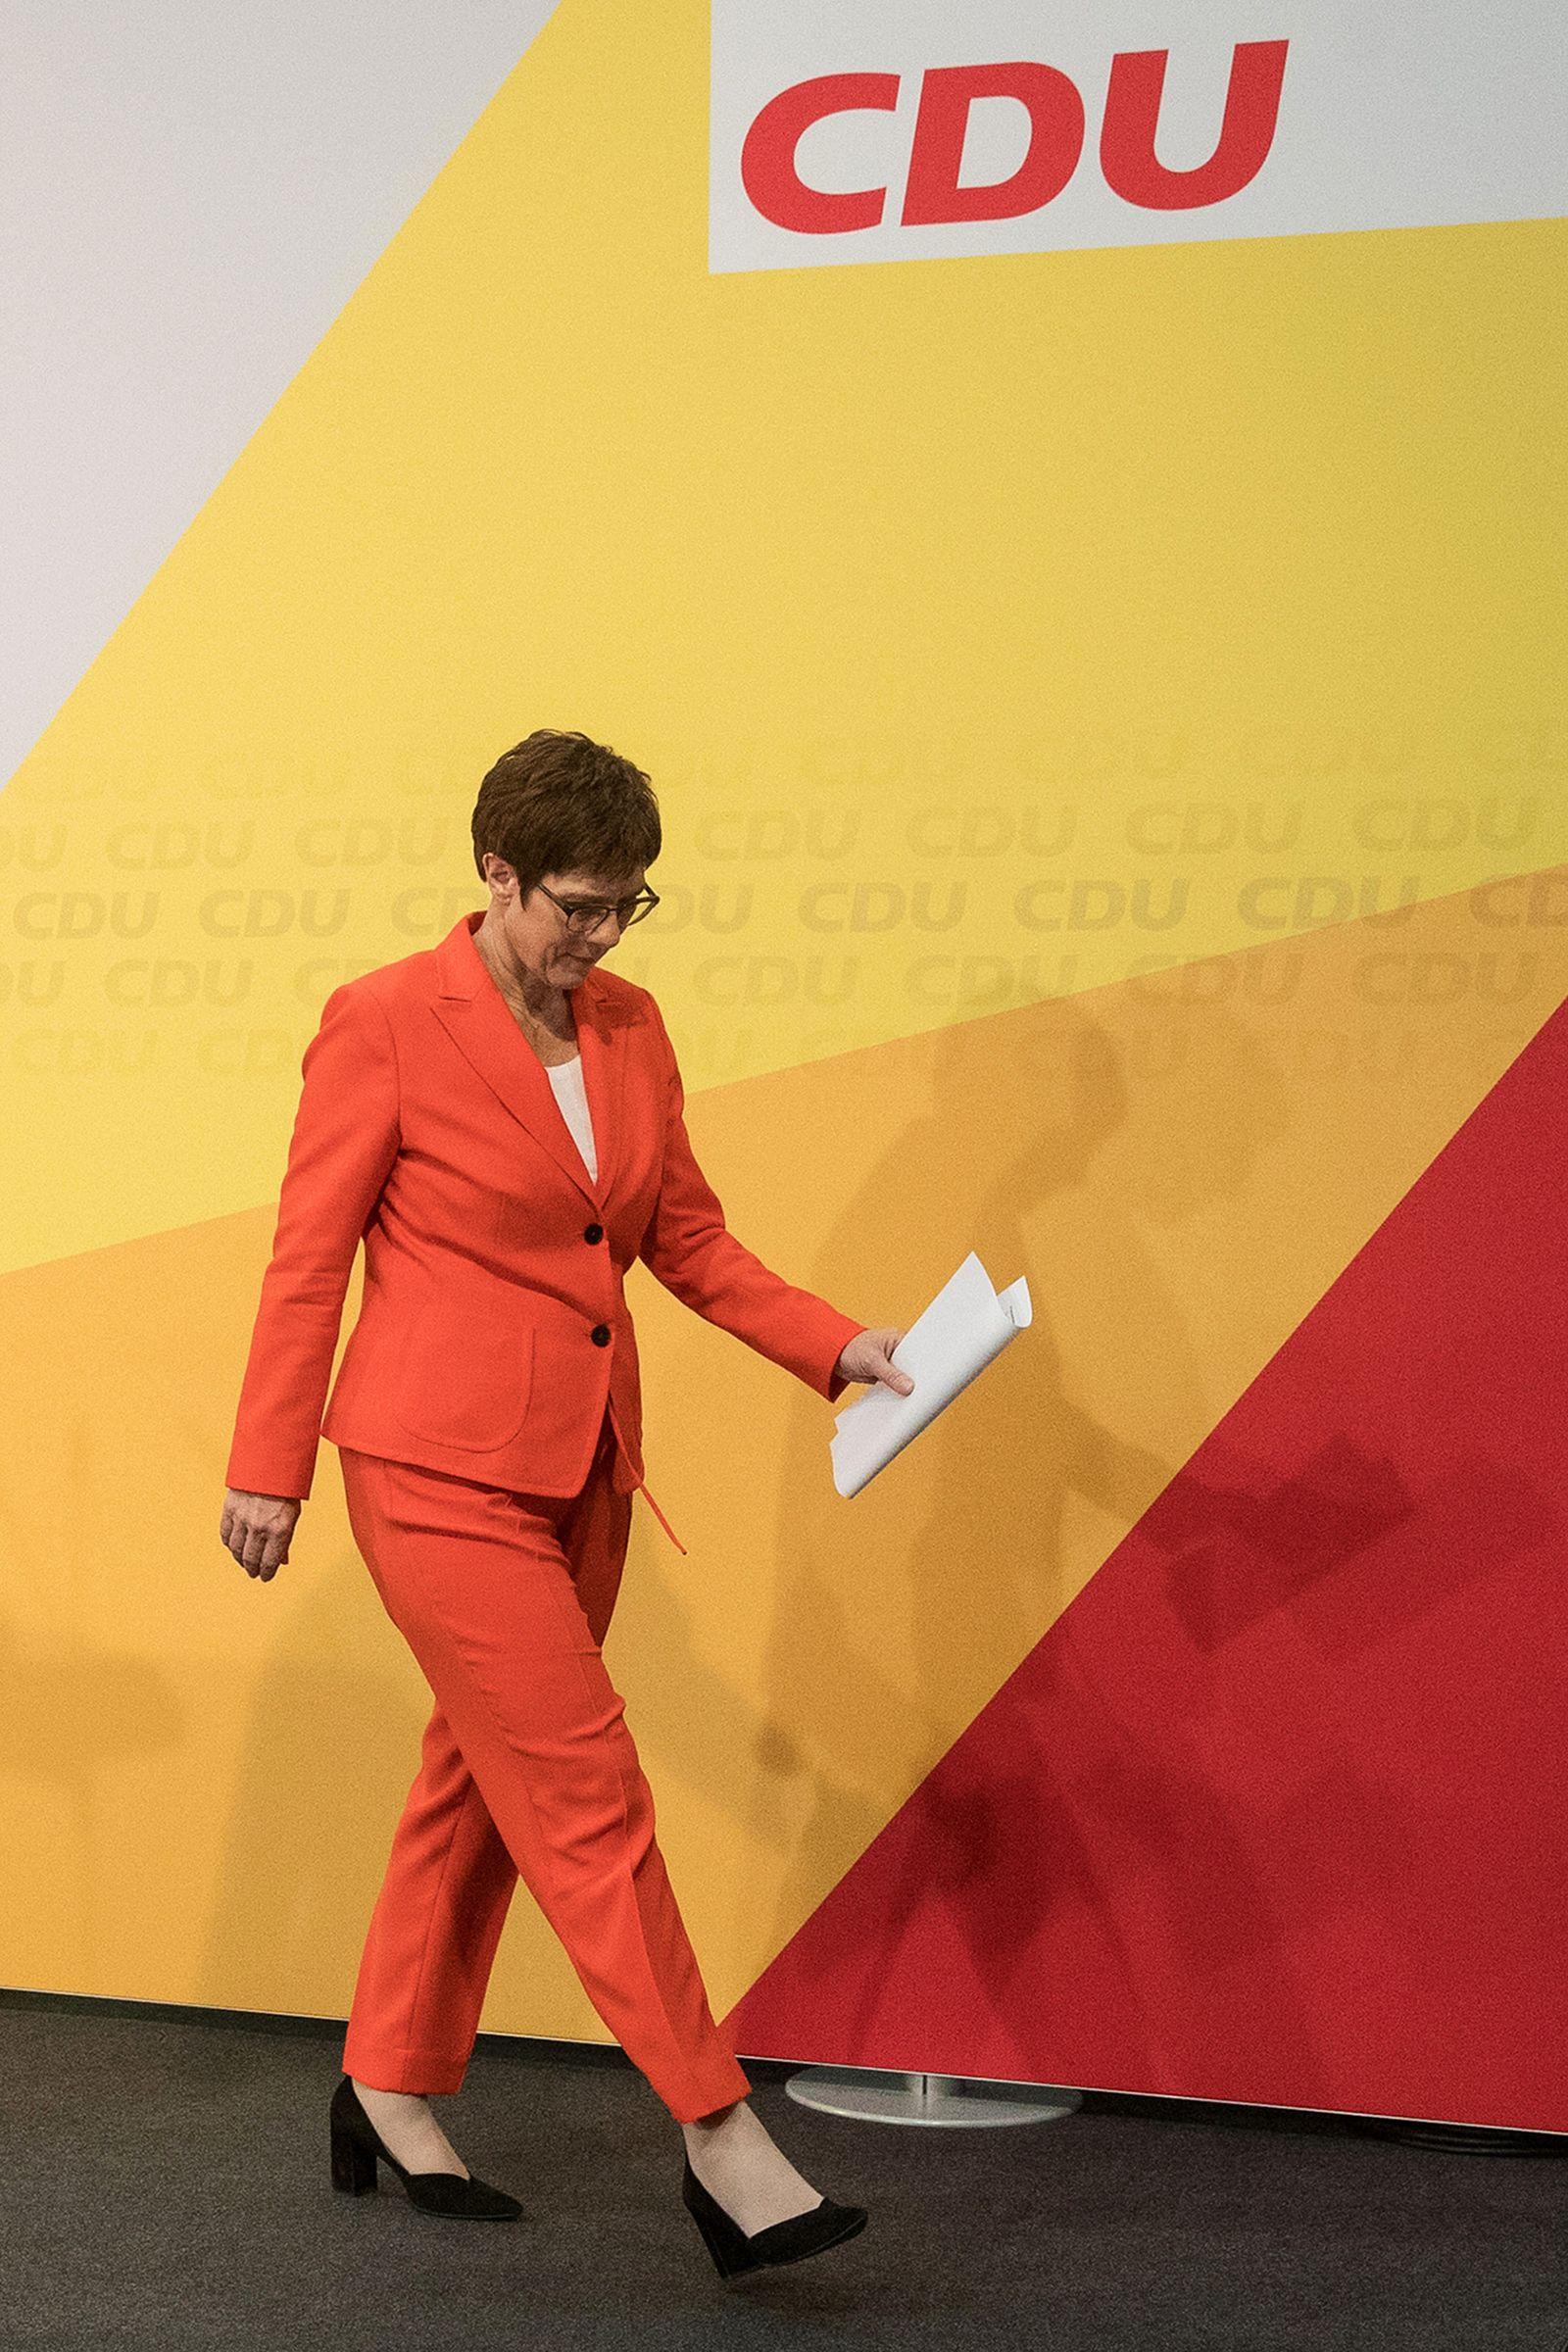 Christian Democrat Union Leadership Hold Coalition Crisis Meeting